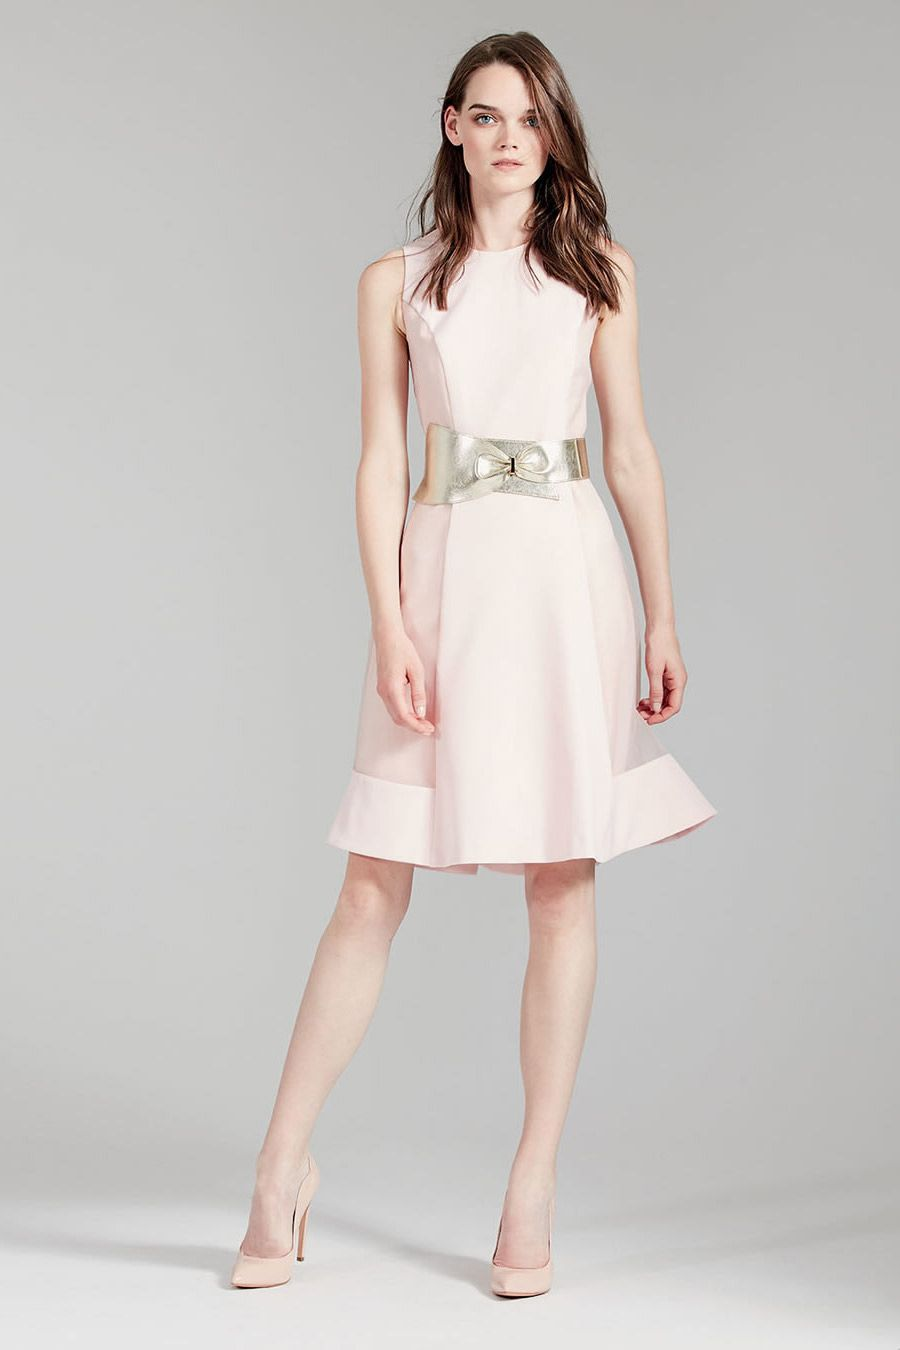 top fashion c00b0 427c8 Modell Isabella Andersson ANNARITA N Shop Online: collezione ...